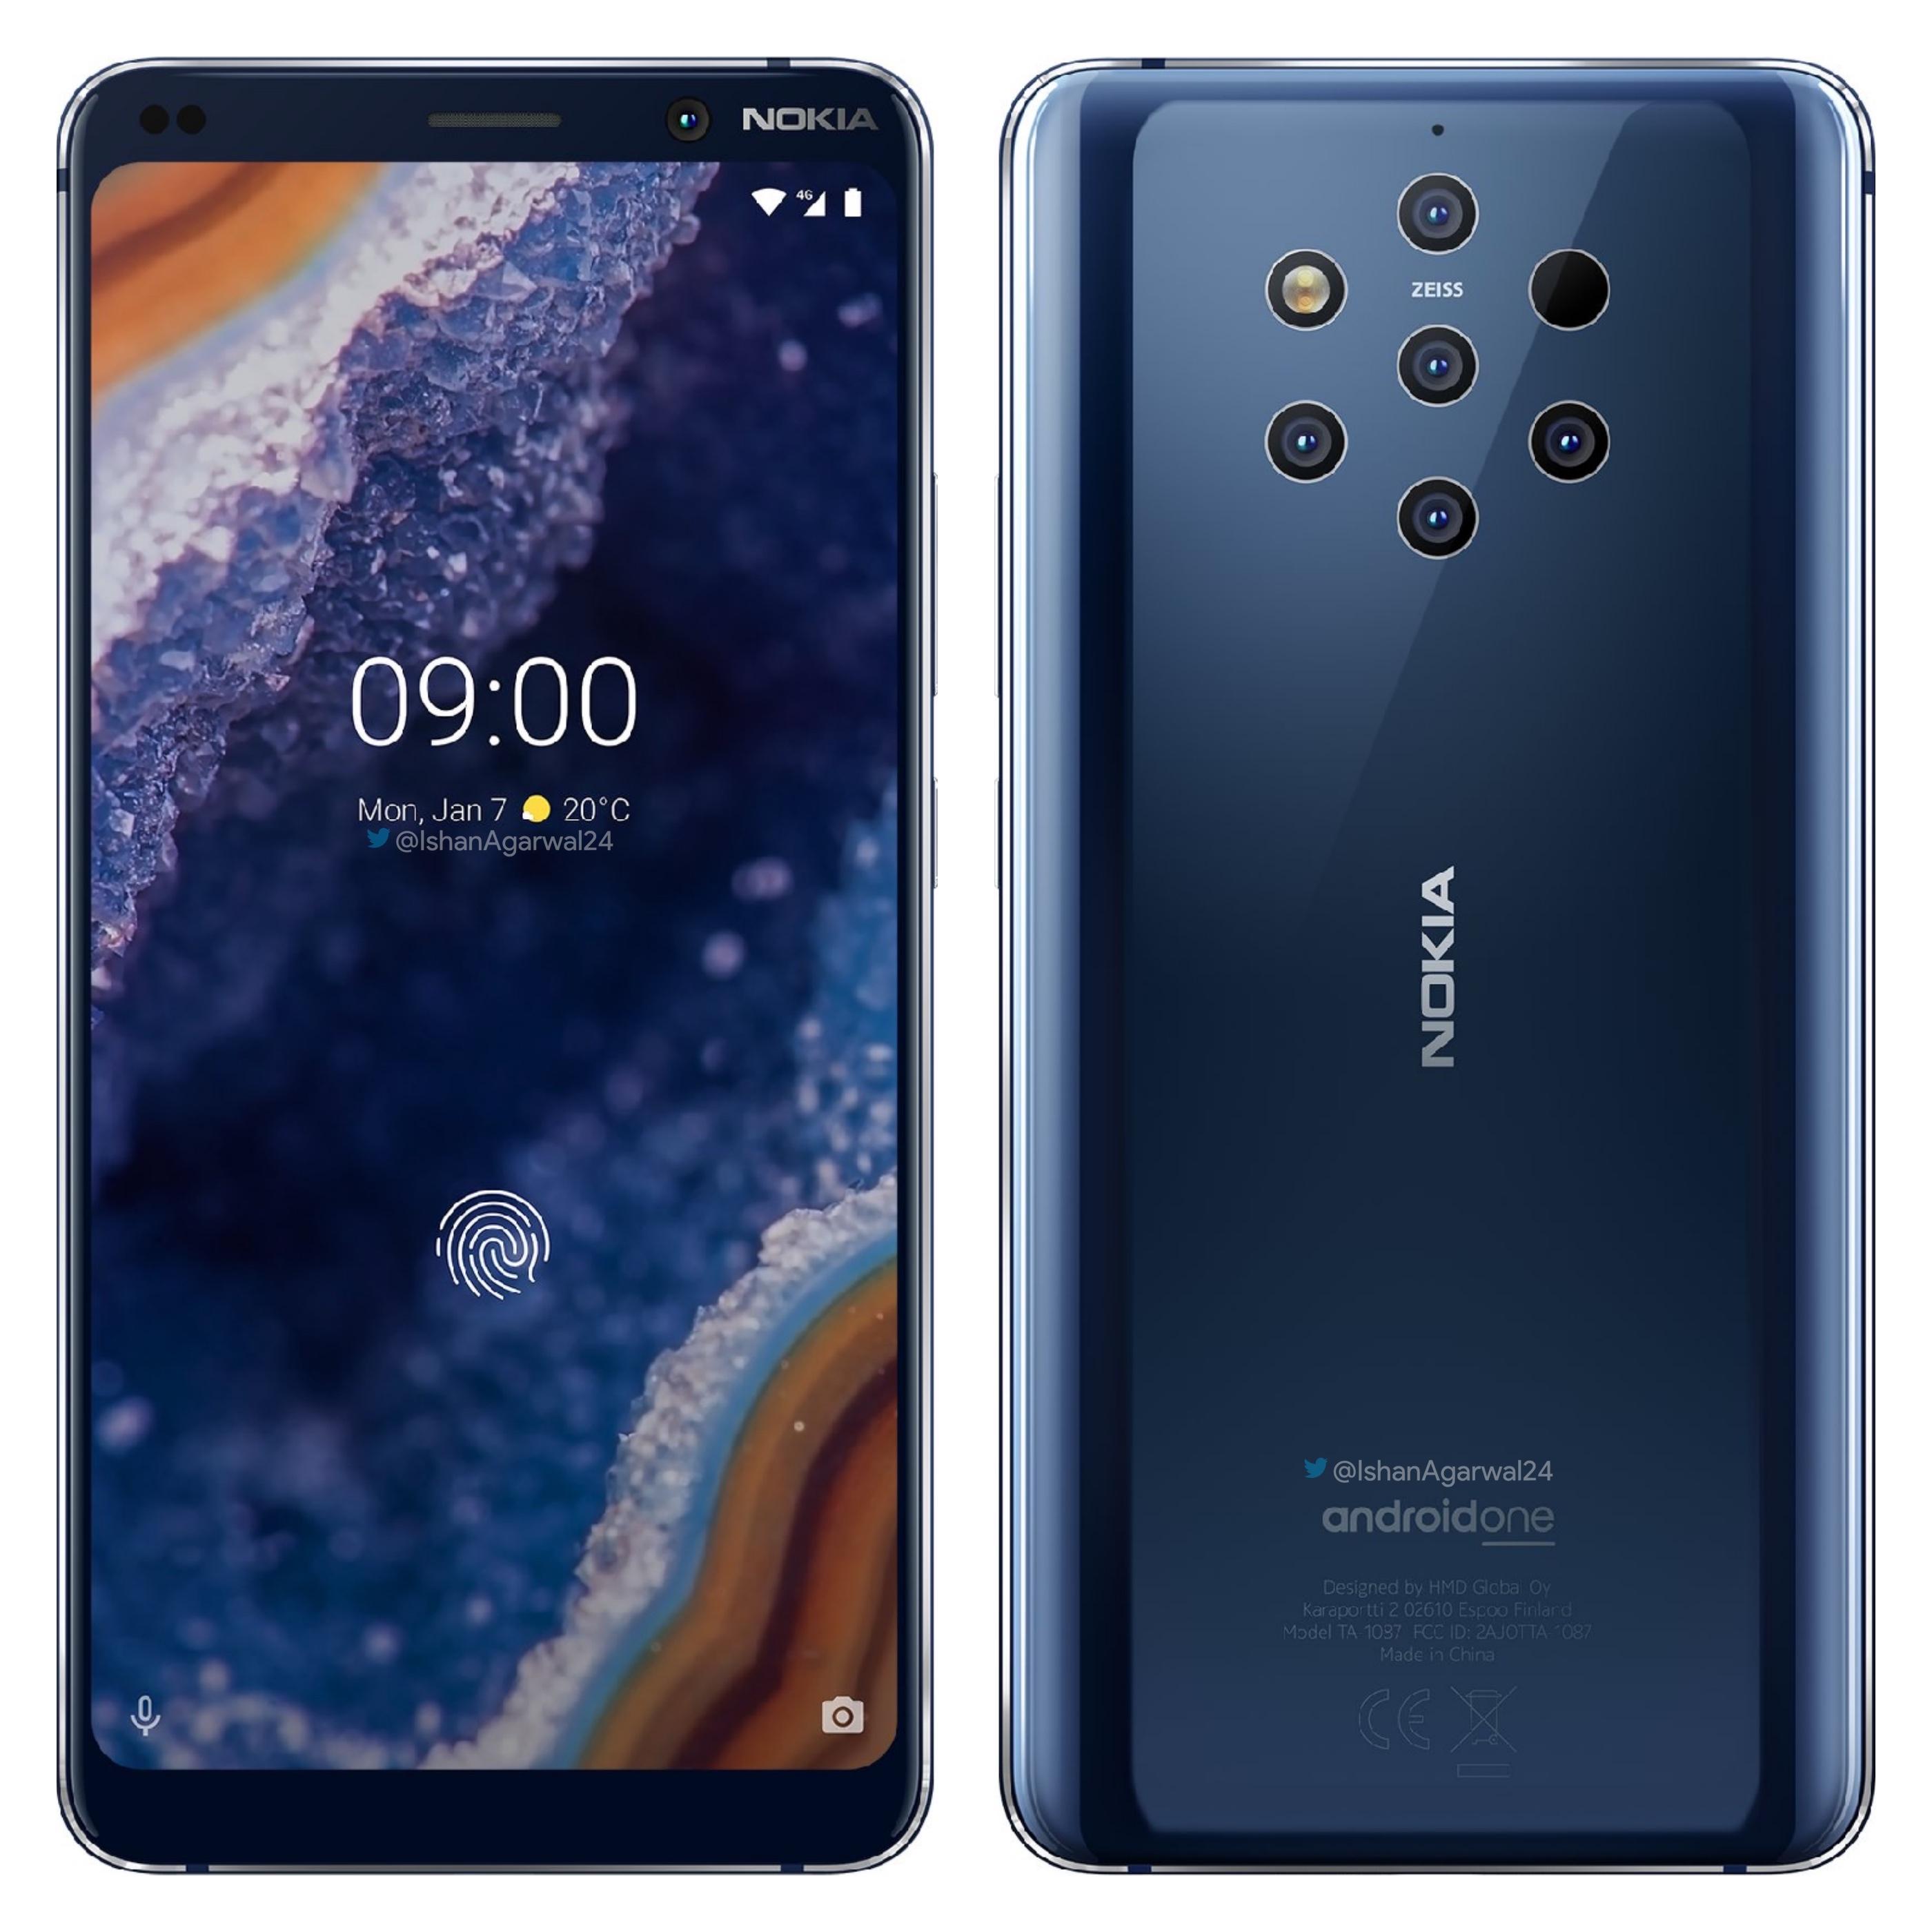 Rumor Nokia 9 At 599 Nokia 4 2 At 199 Nokia 3 2 At 149 And Nokia 1 Plus At 99 Update X2 Photo Sample Nokiamob